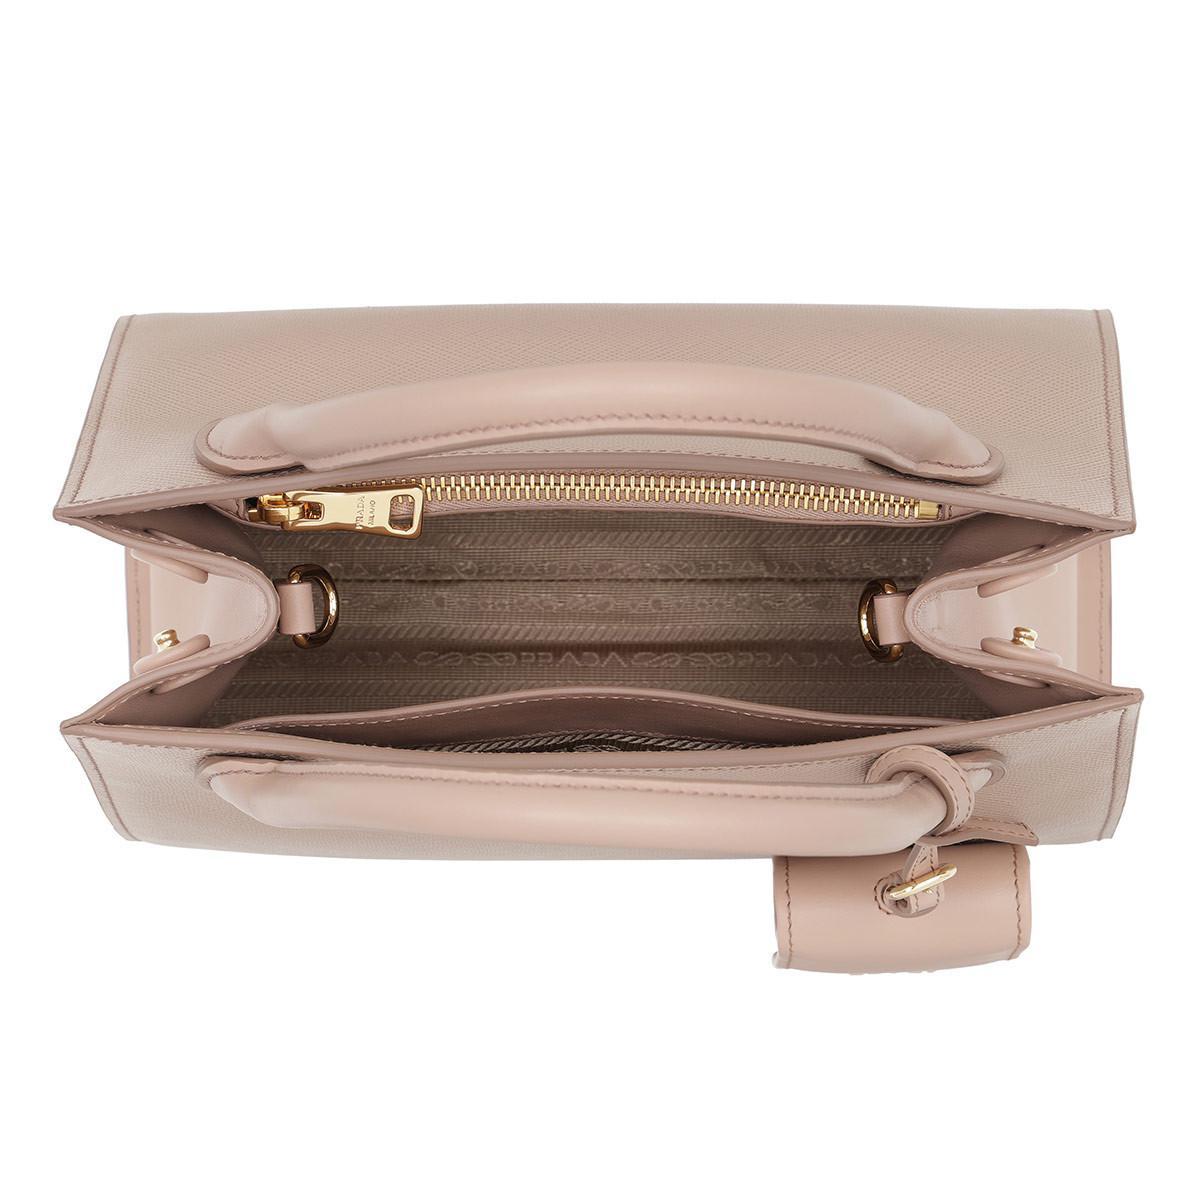 Prada Leather Monochrome Tote Bag Cipria in Beige (Natural)